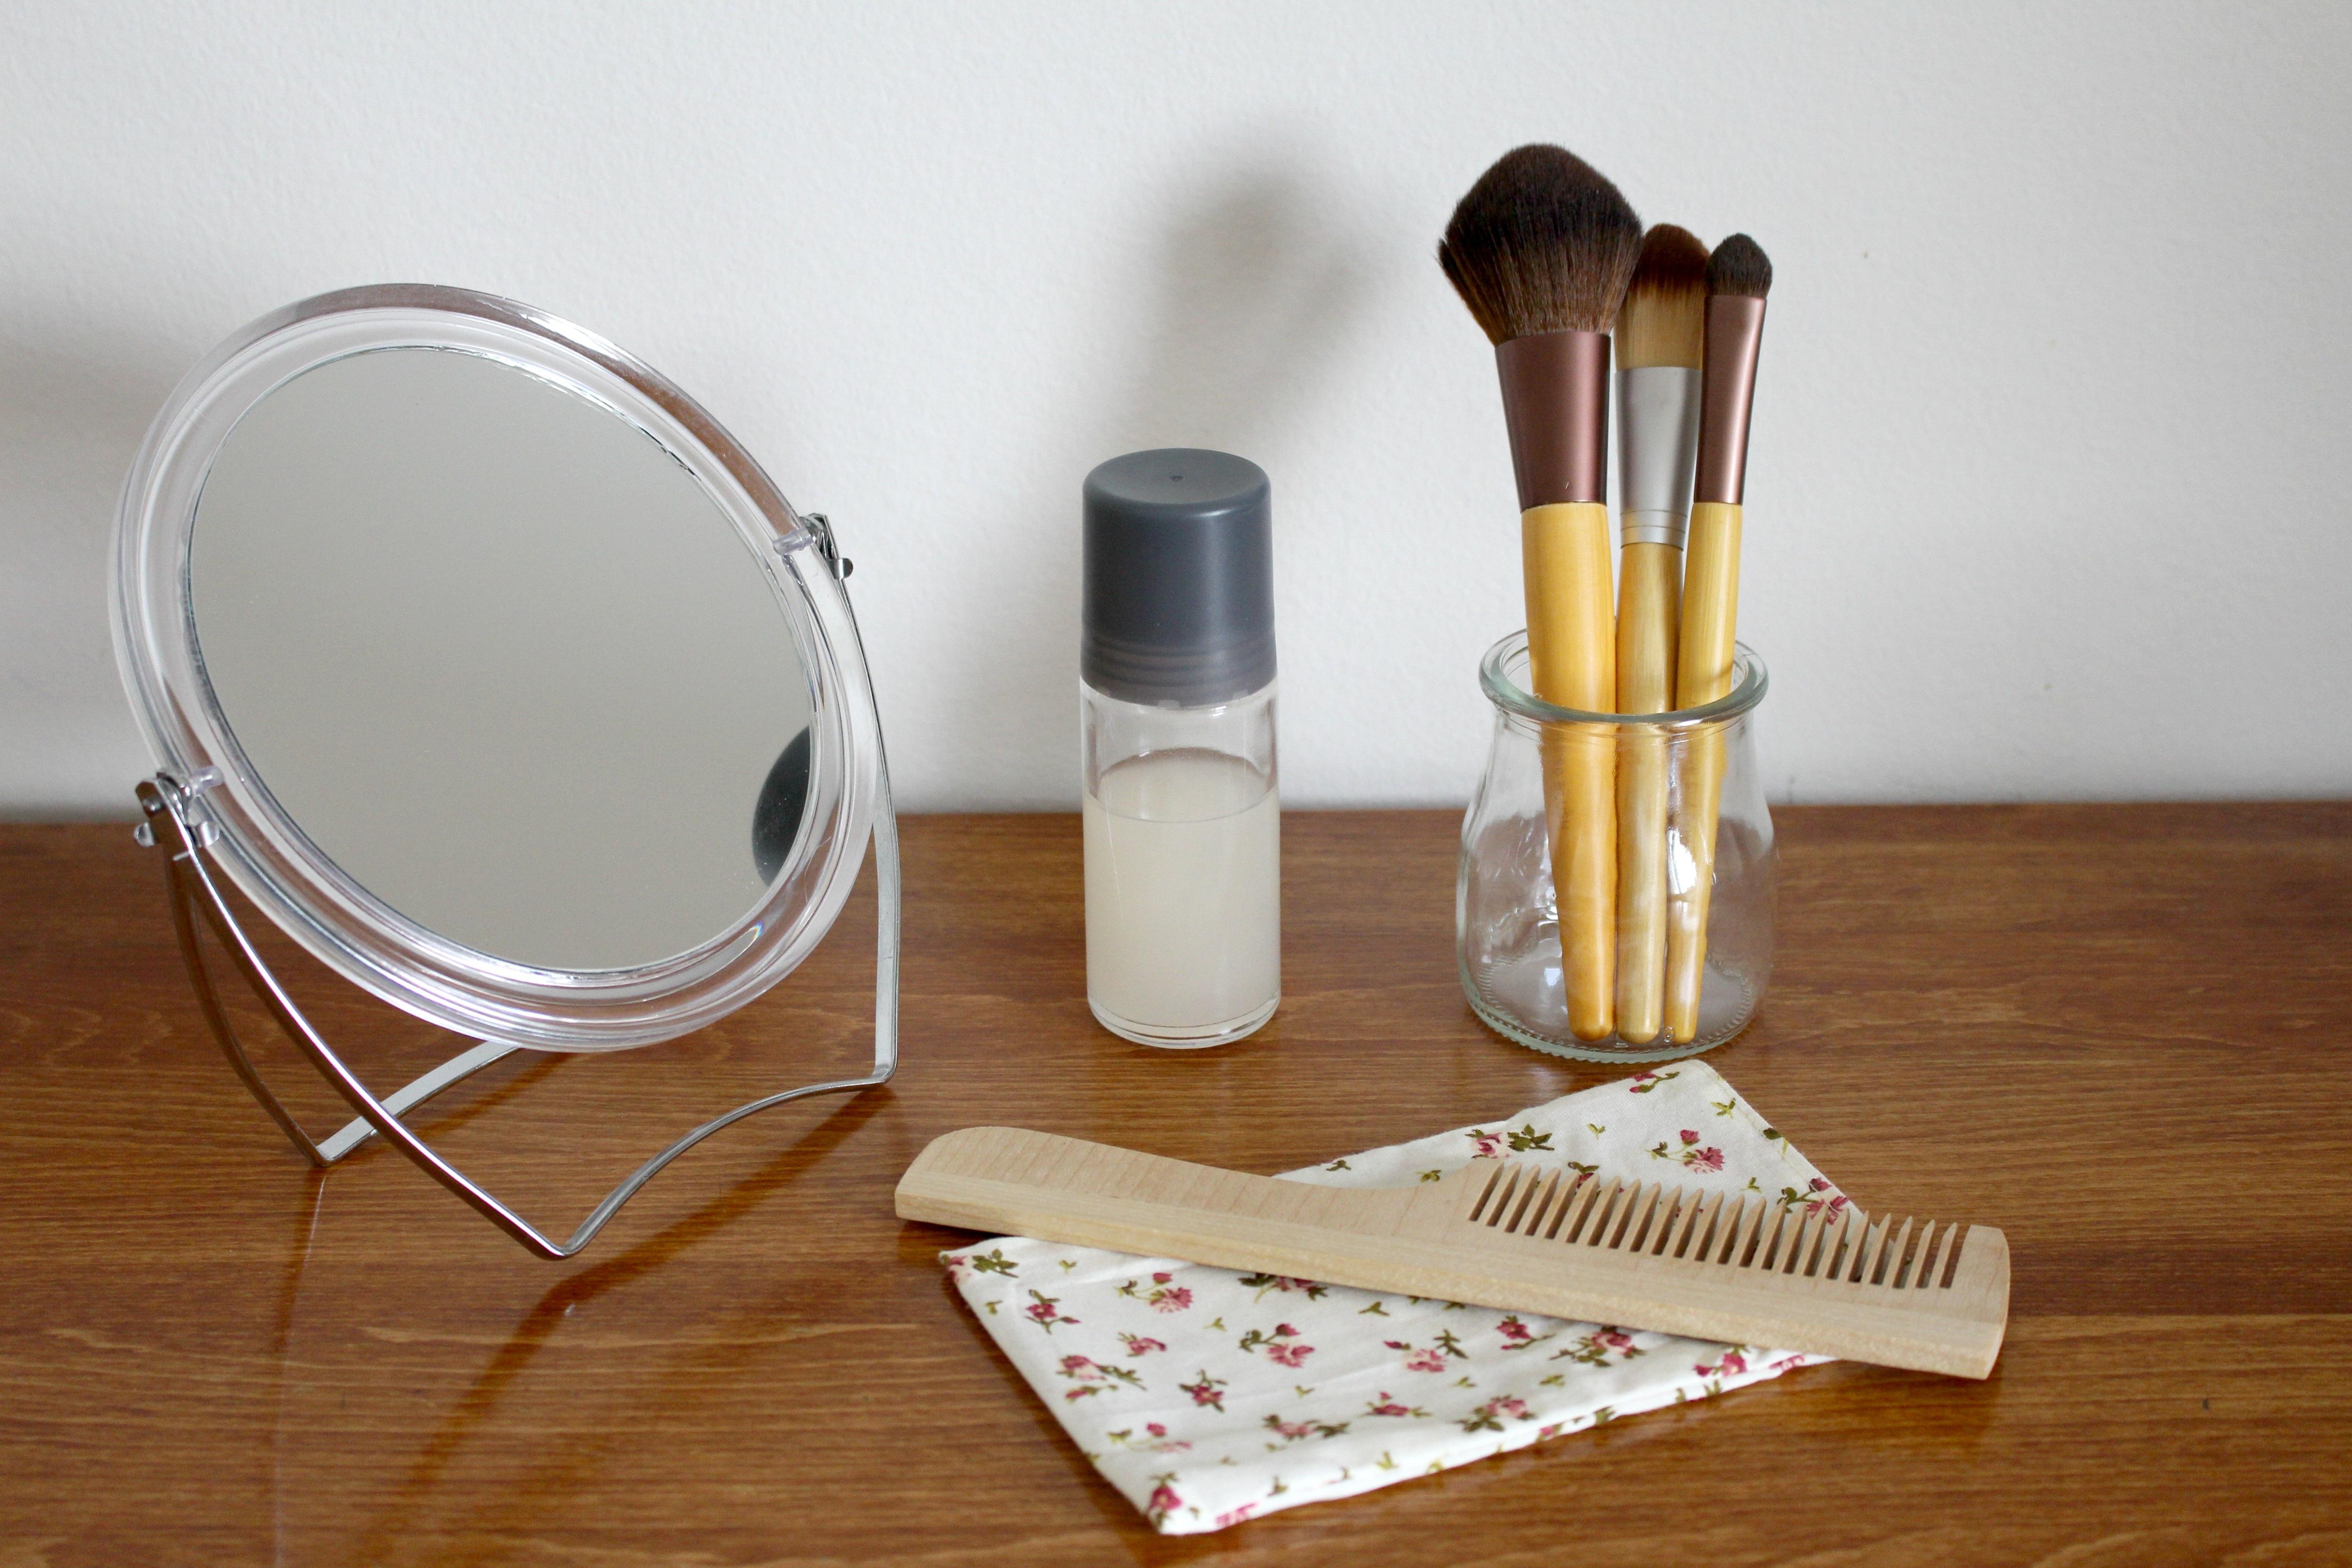 Nature Hair Glass Brush Macro Healthy Close Lighting Material American Mirror Beauty Beautiful Area Organ